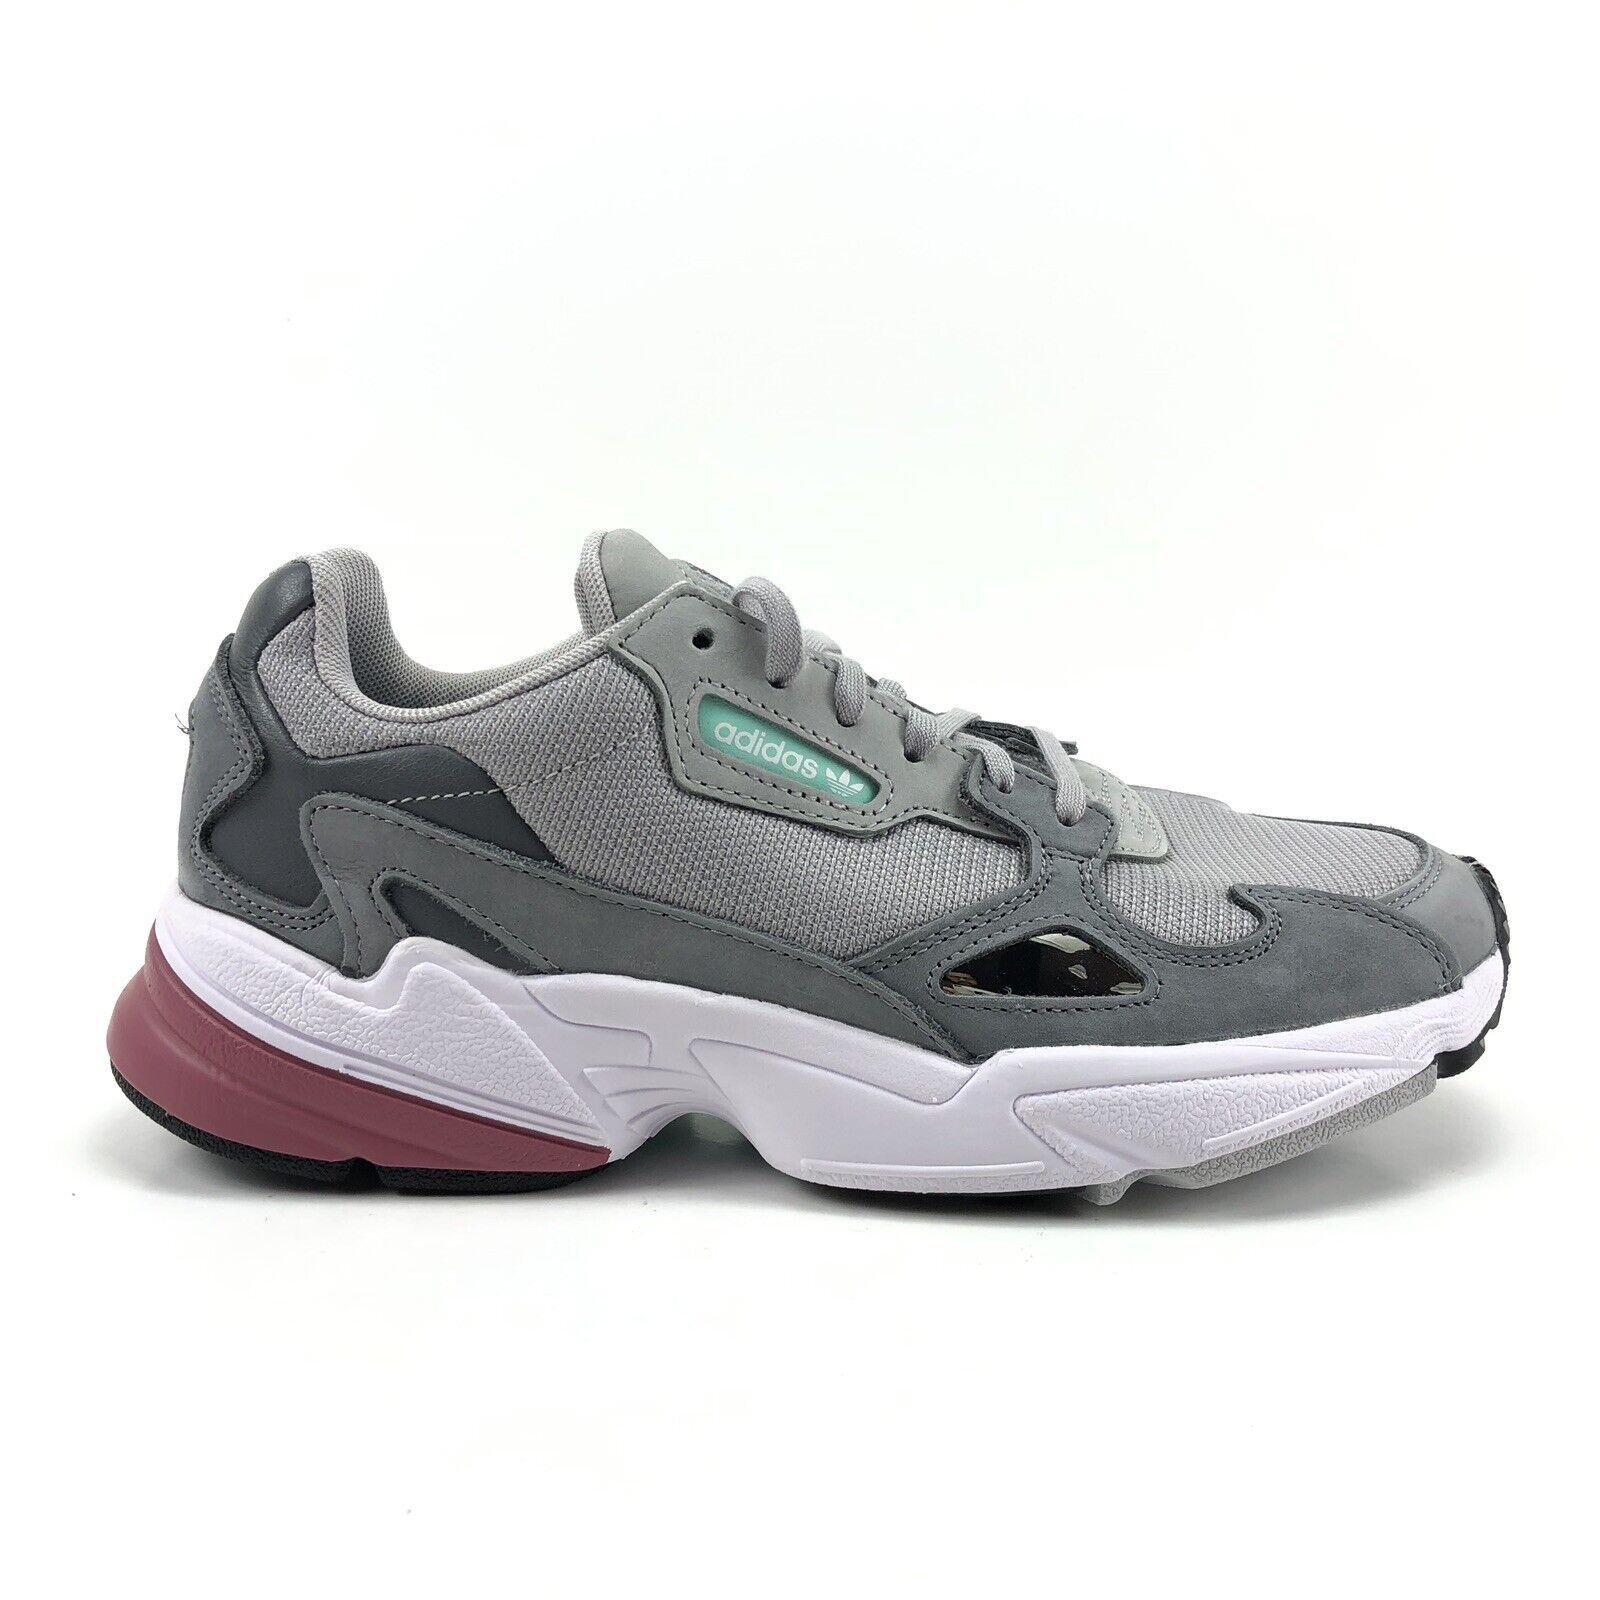 Adidas Falcon donna  Fashion Running scarpe grigio Kylie Jenner  consegna veloce